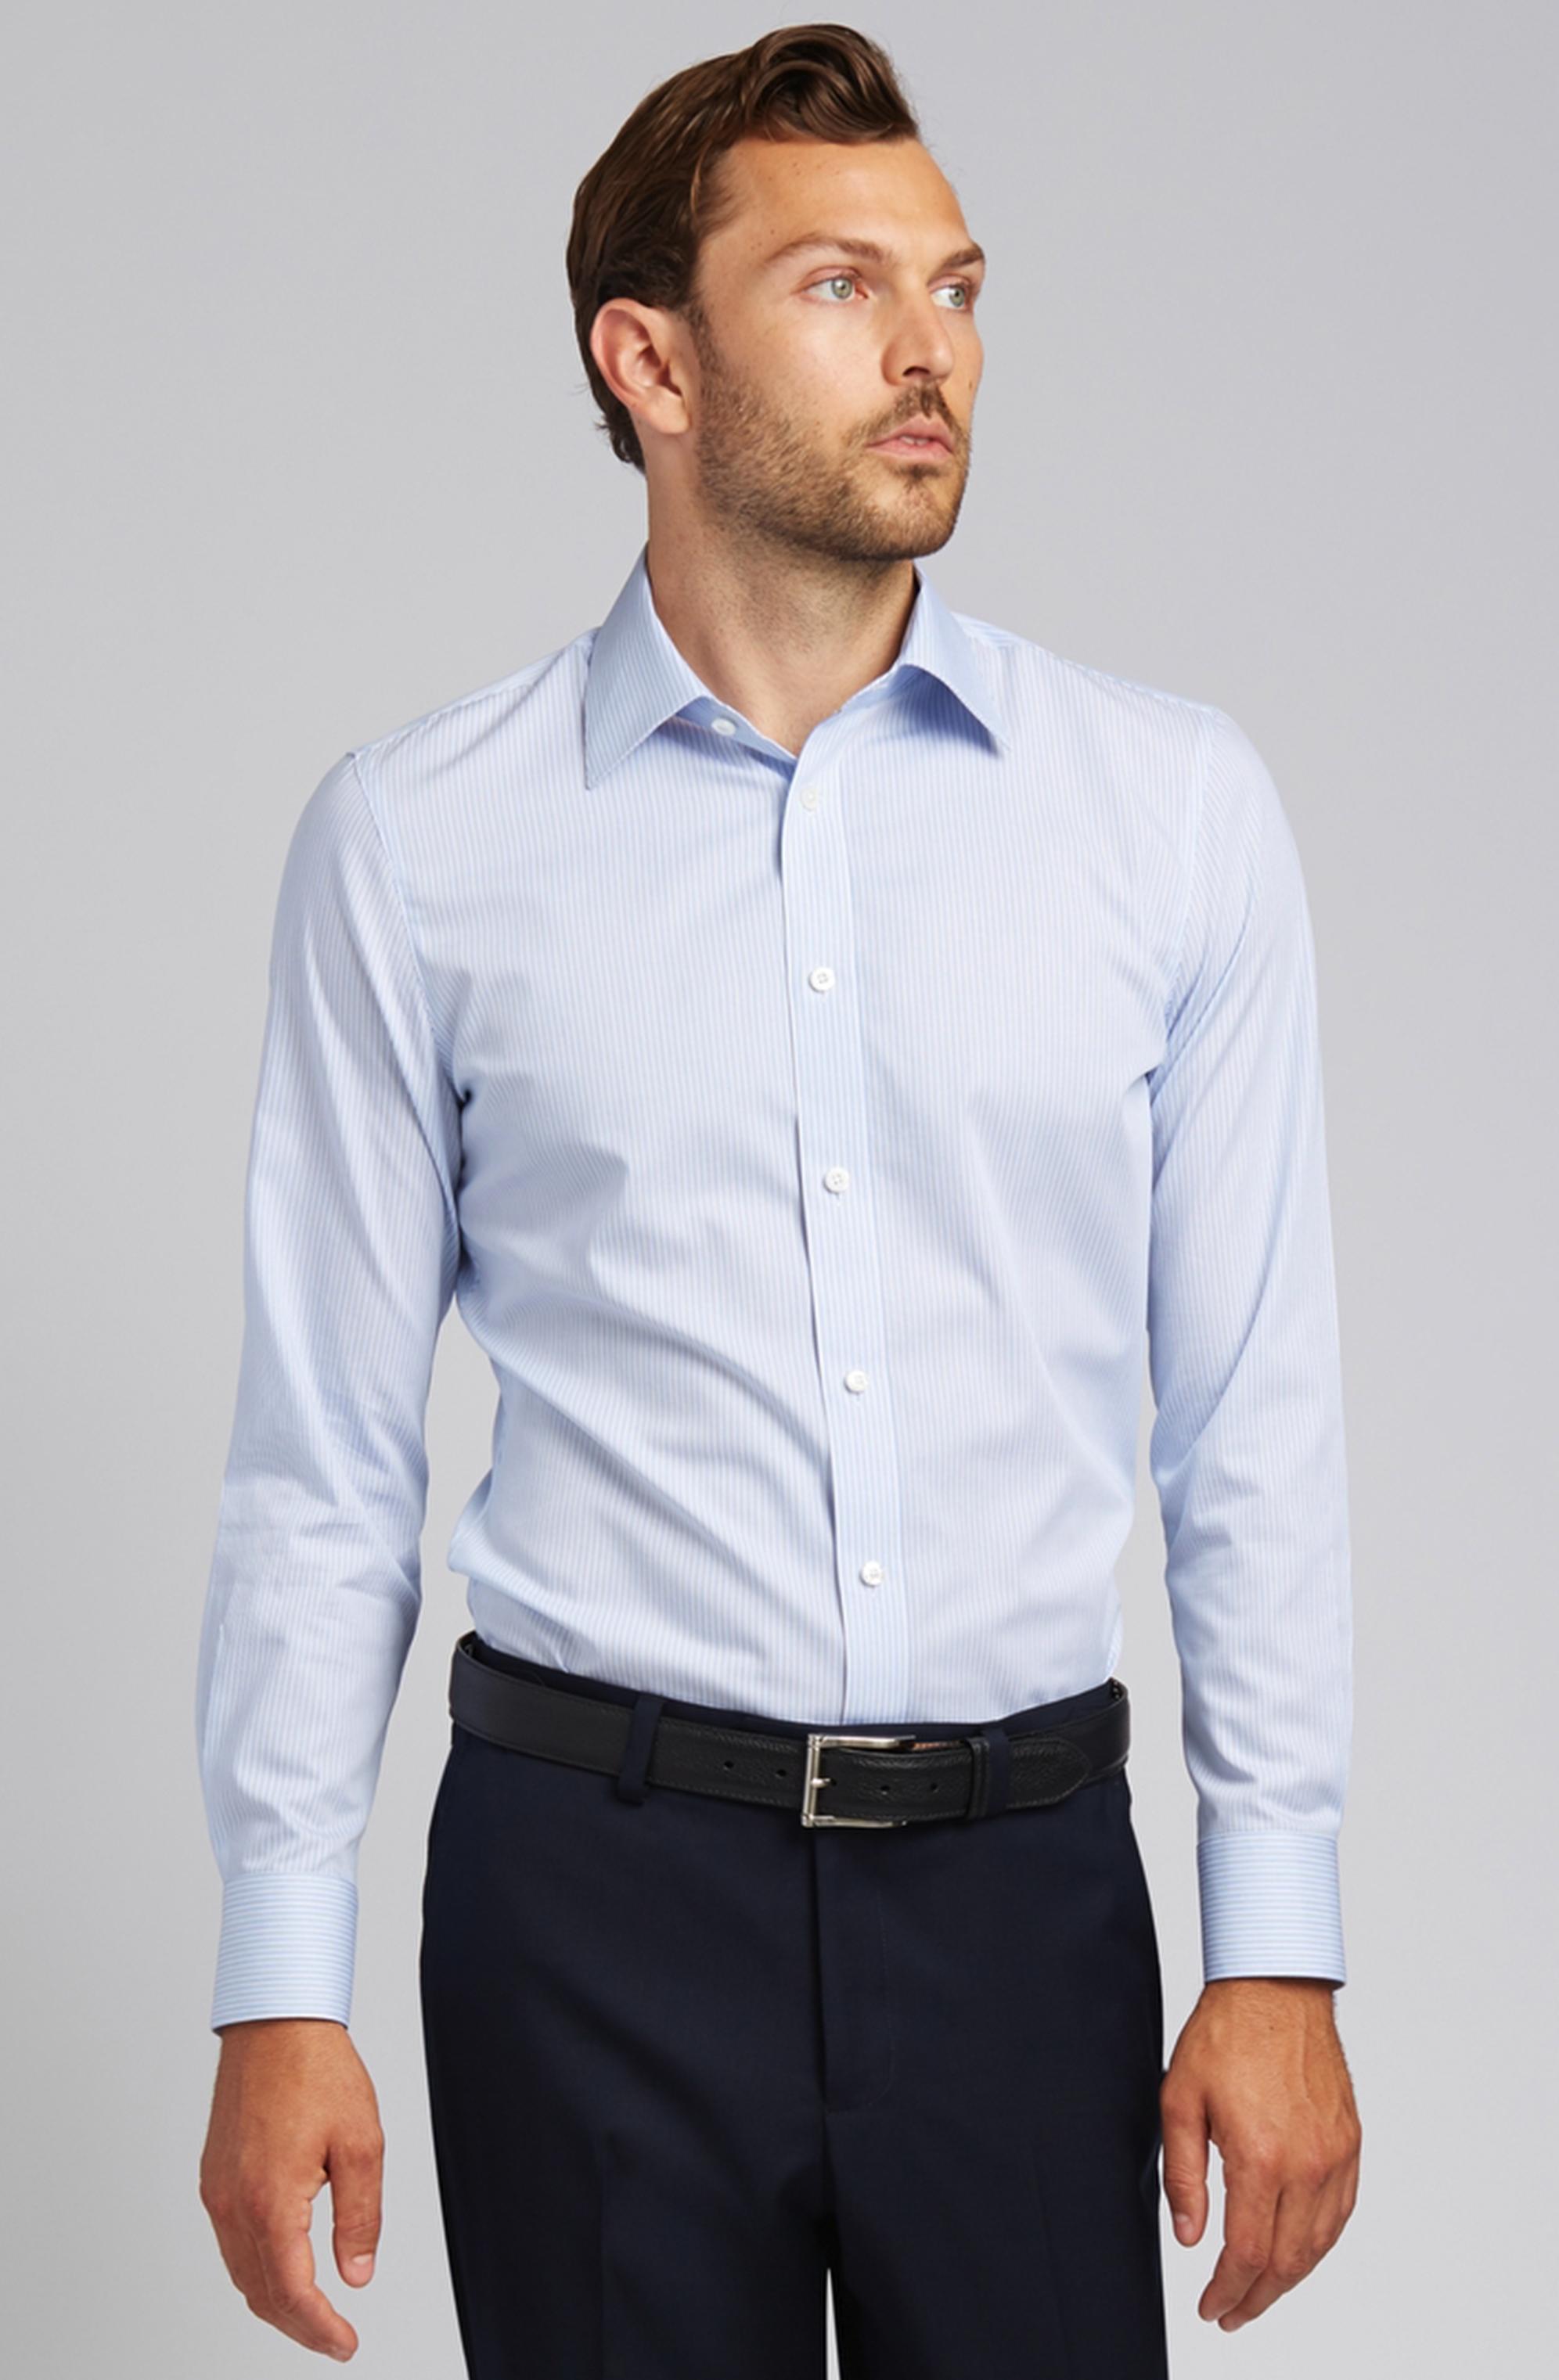 Button-Front Dress Shirt in Vertical Blue Stripe